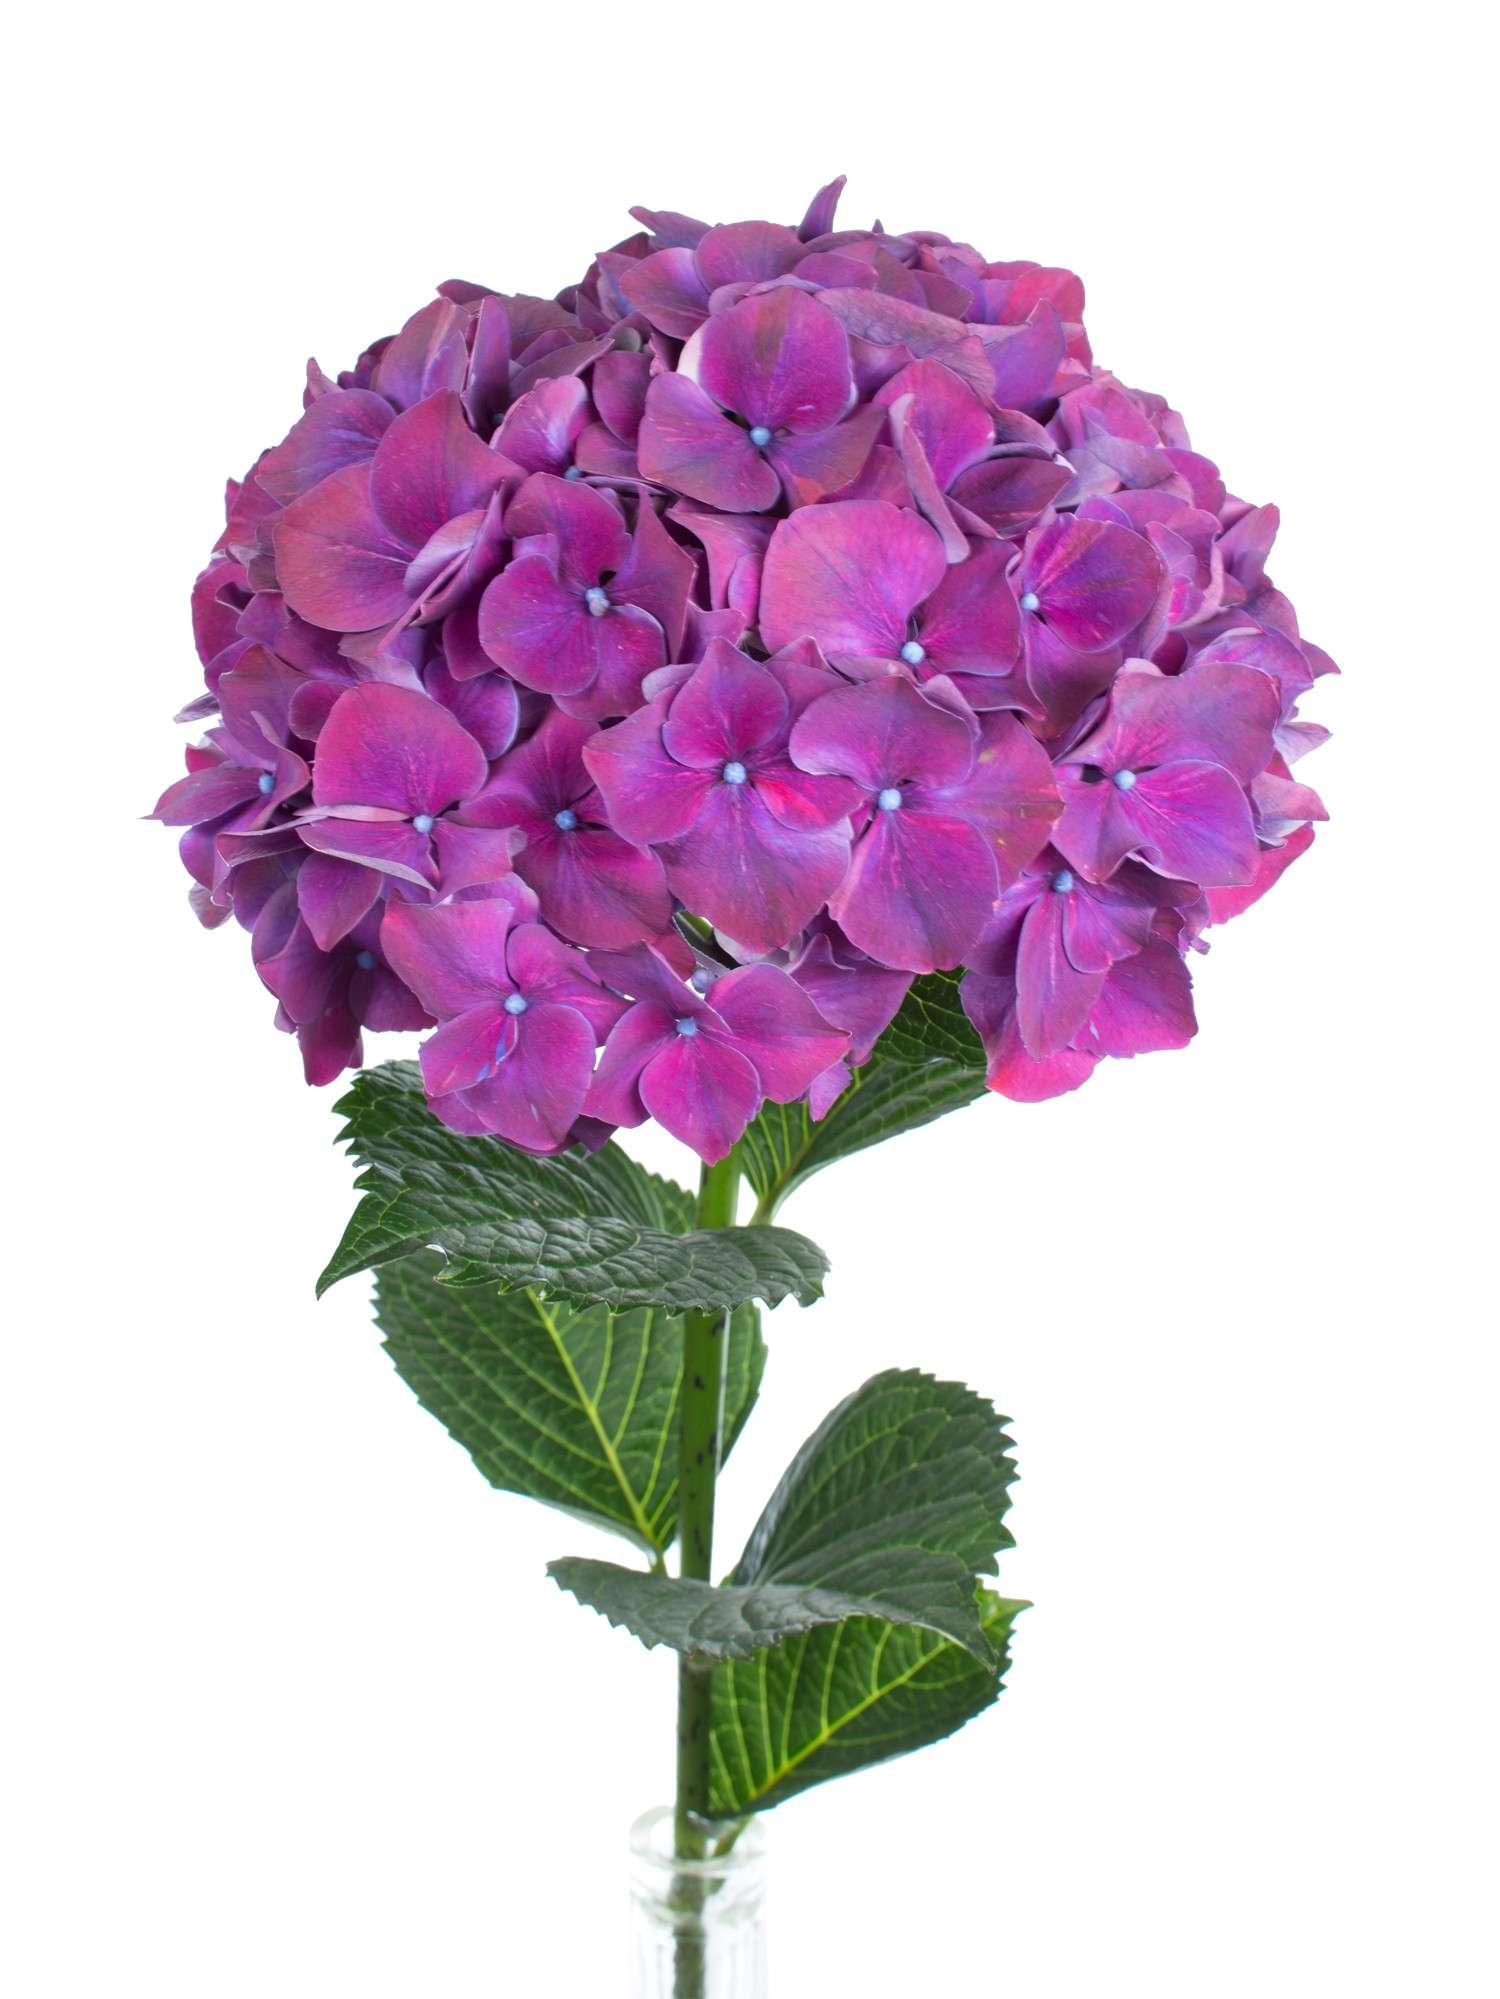 hortensie magical rubyred aubergine lila bestellen blumigo. Black Bedroom Furniture Sets. Home Design Ideas